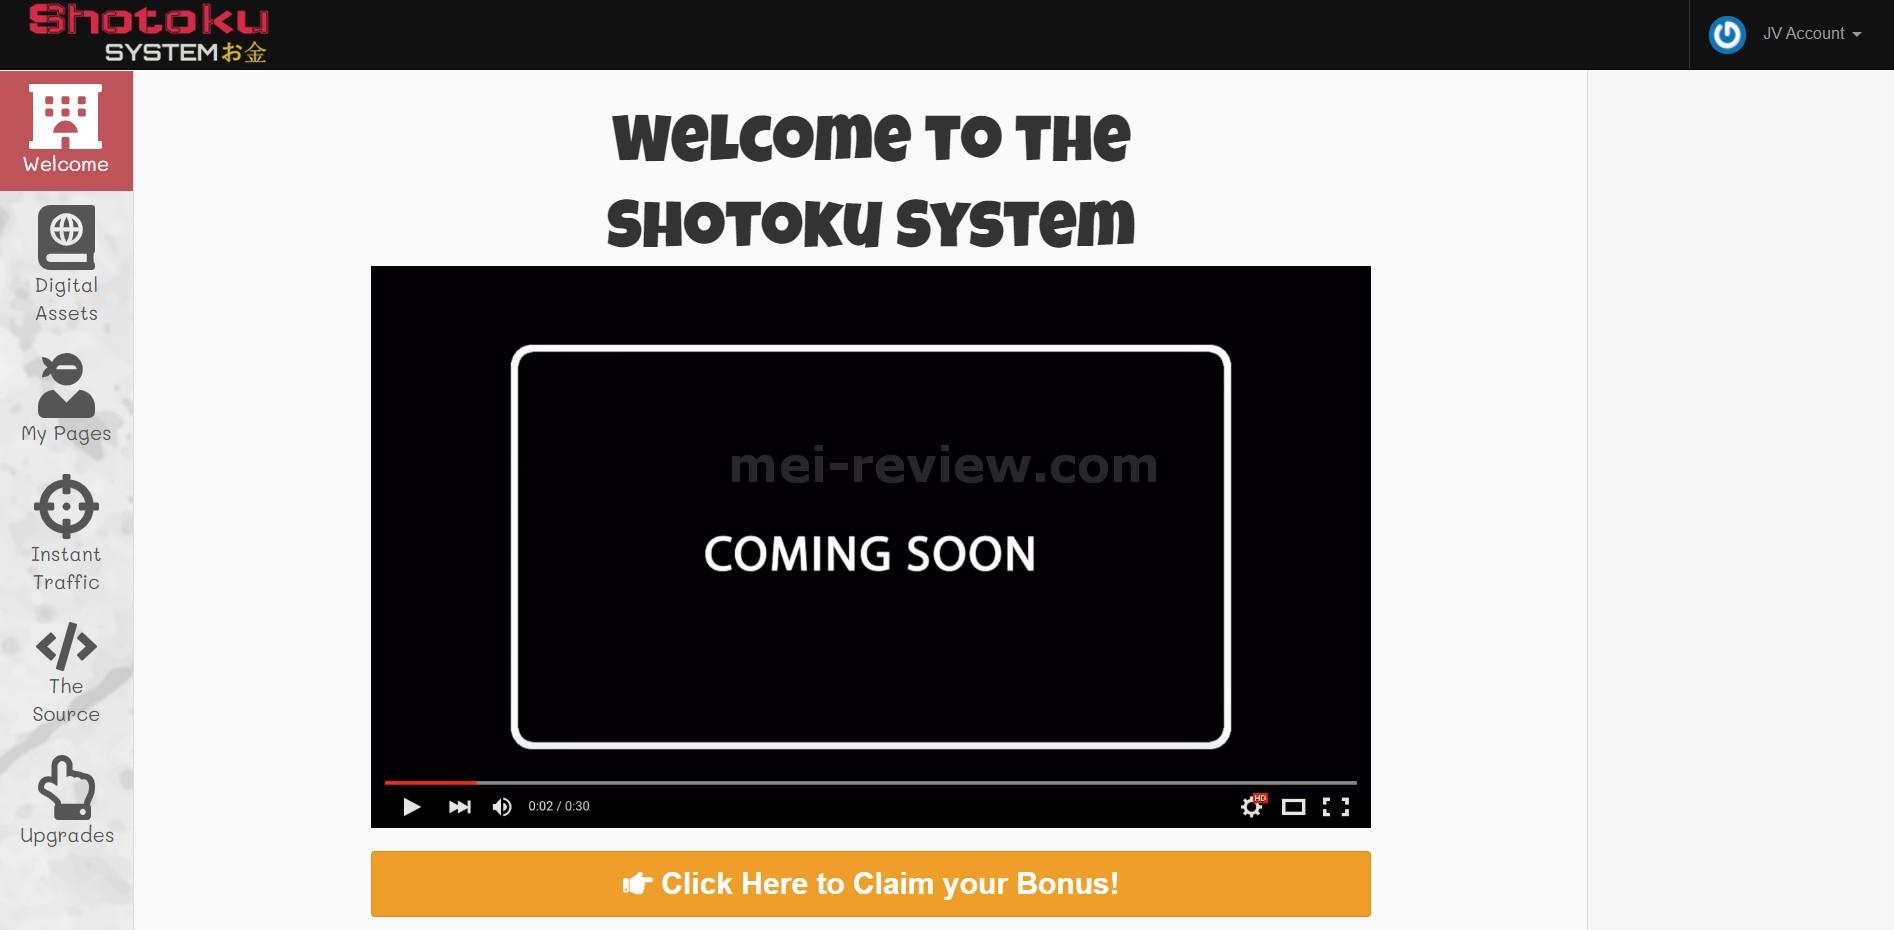 Shotoku-System-feature-2